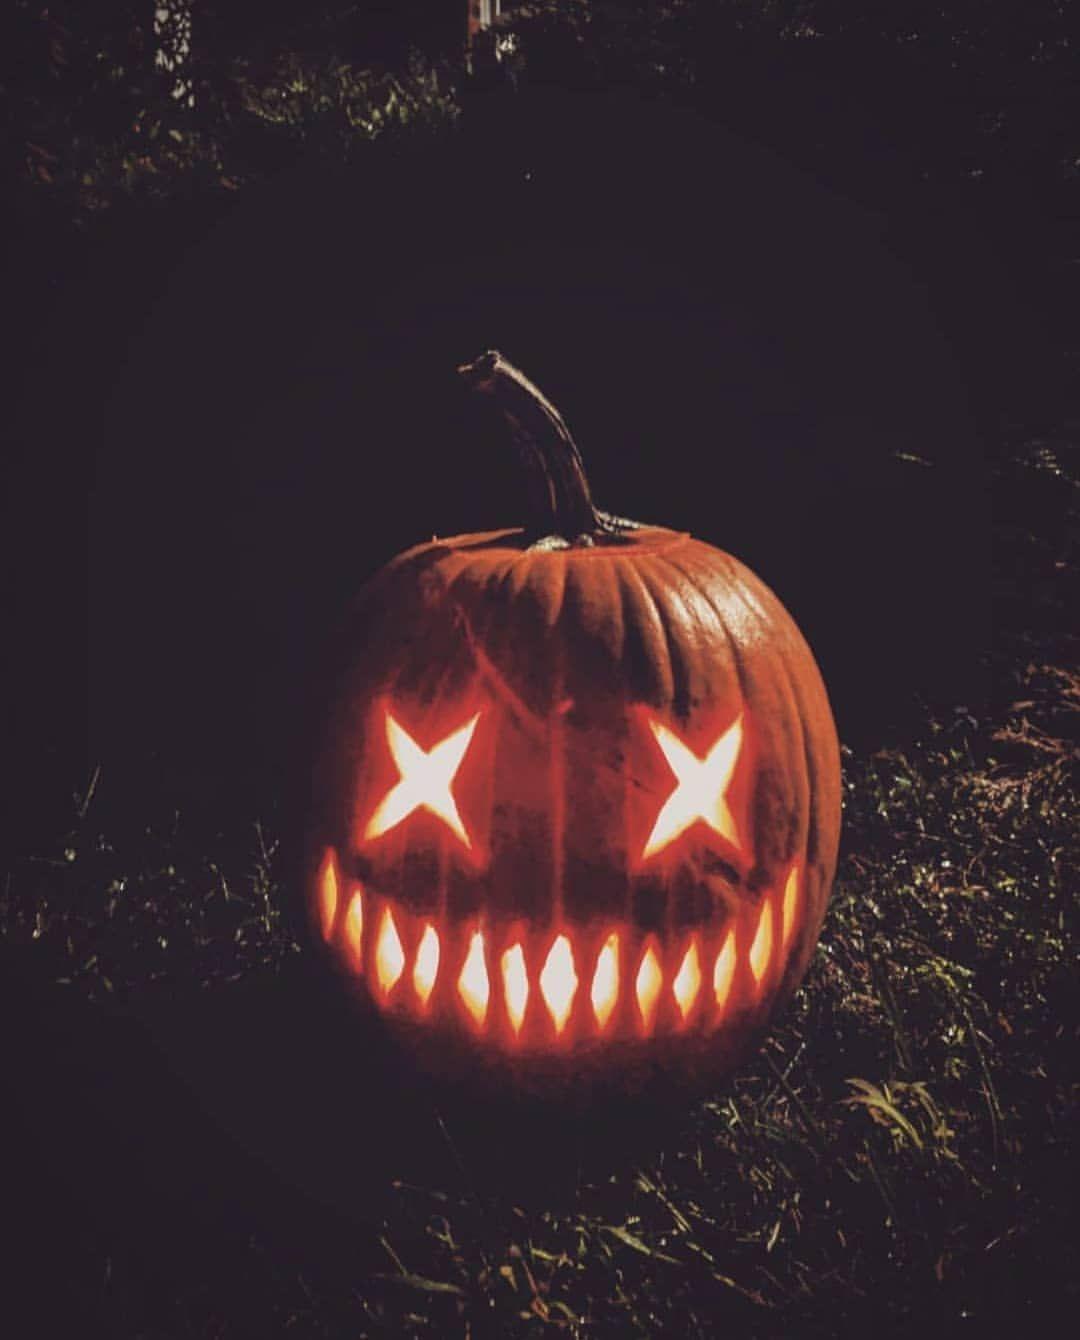 Intagliare Zucca Per Halloween Disegni i am ready for halllloooweeeen | halloween pumpkin designs